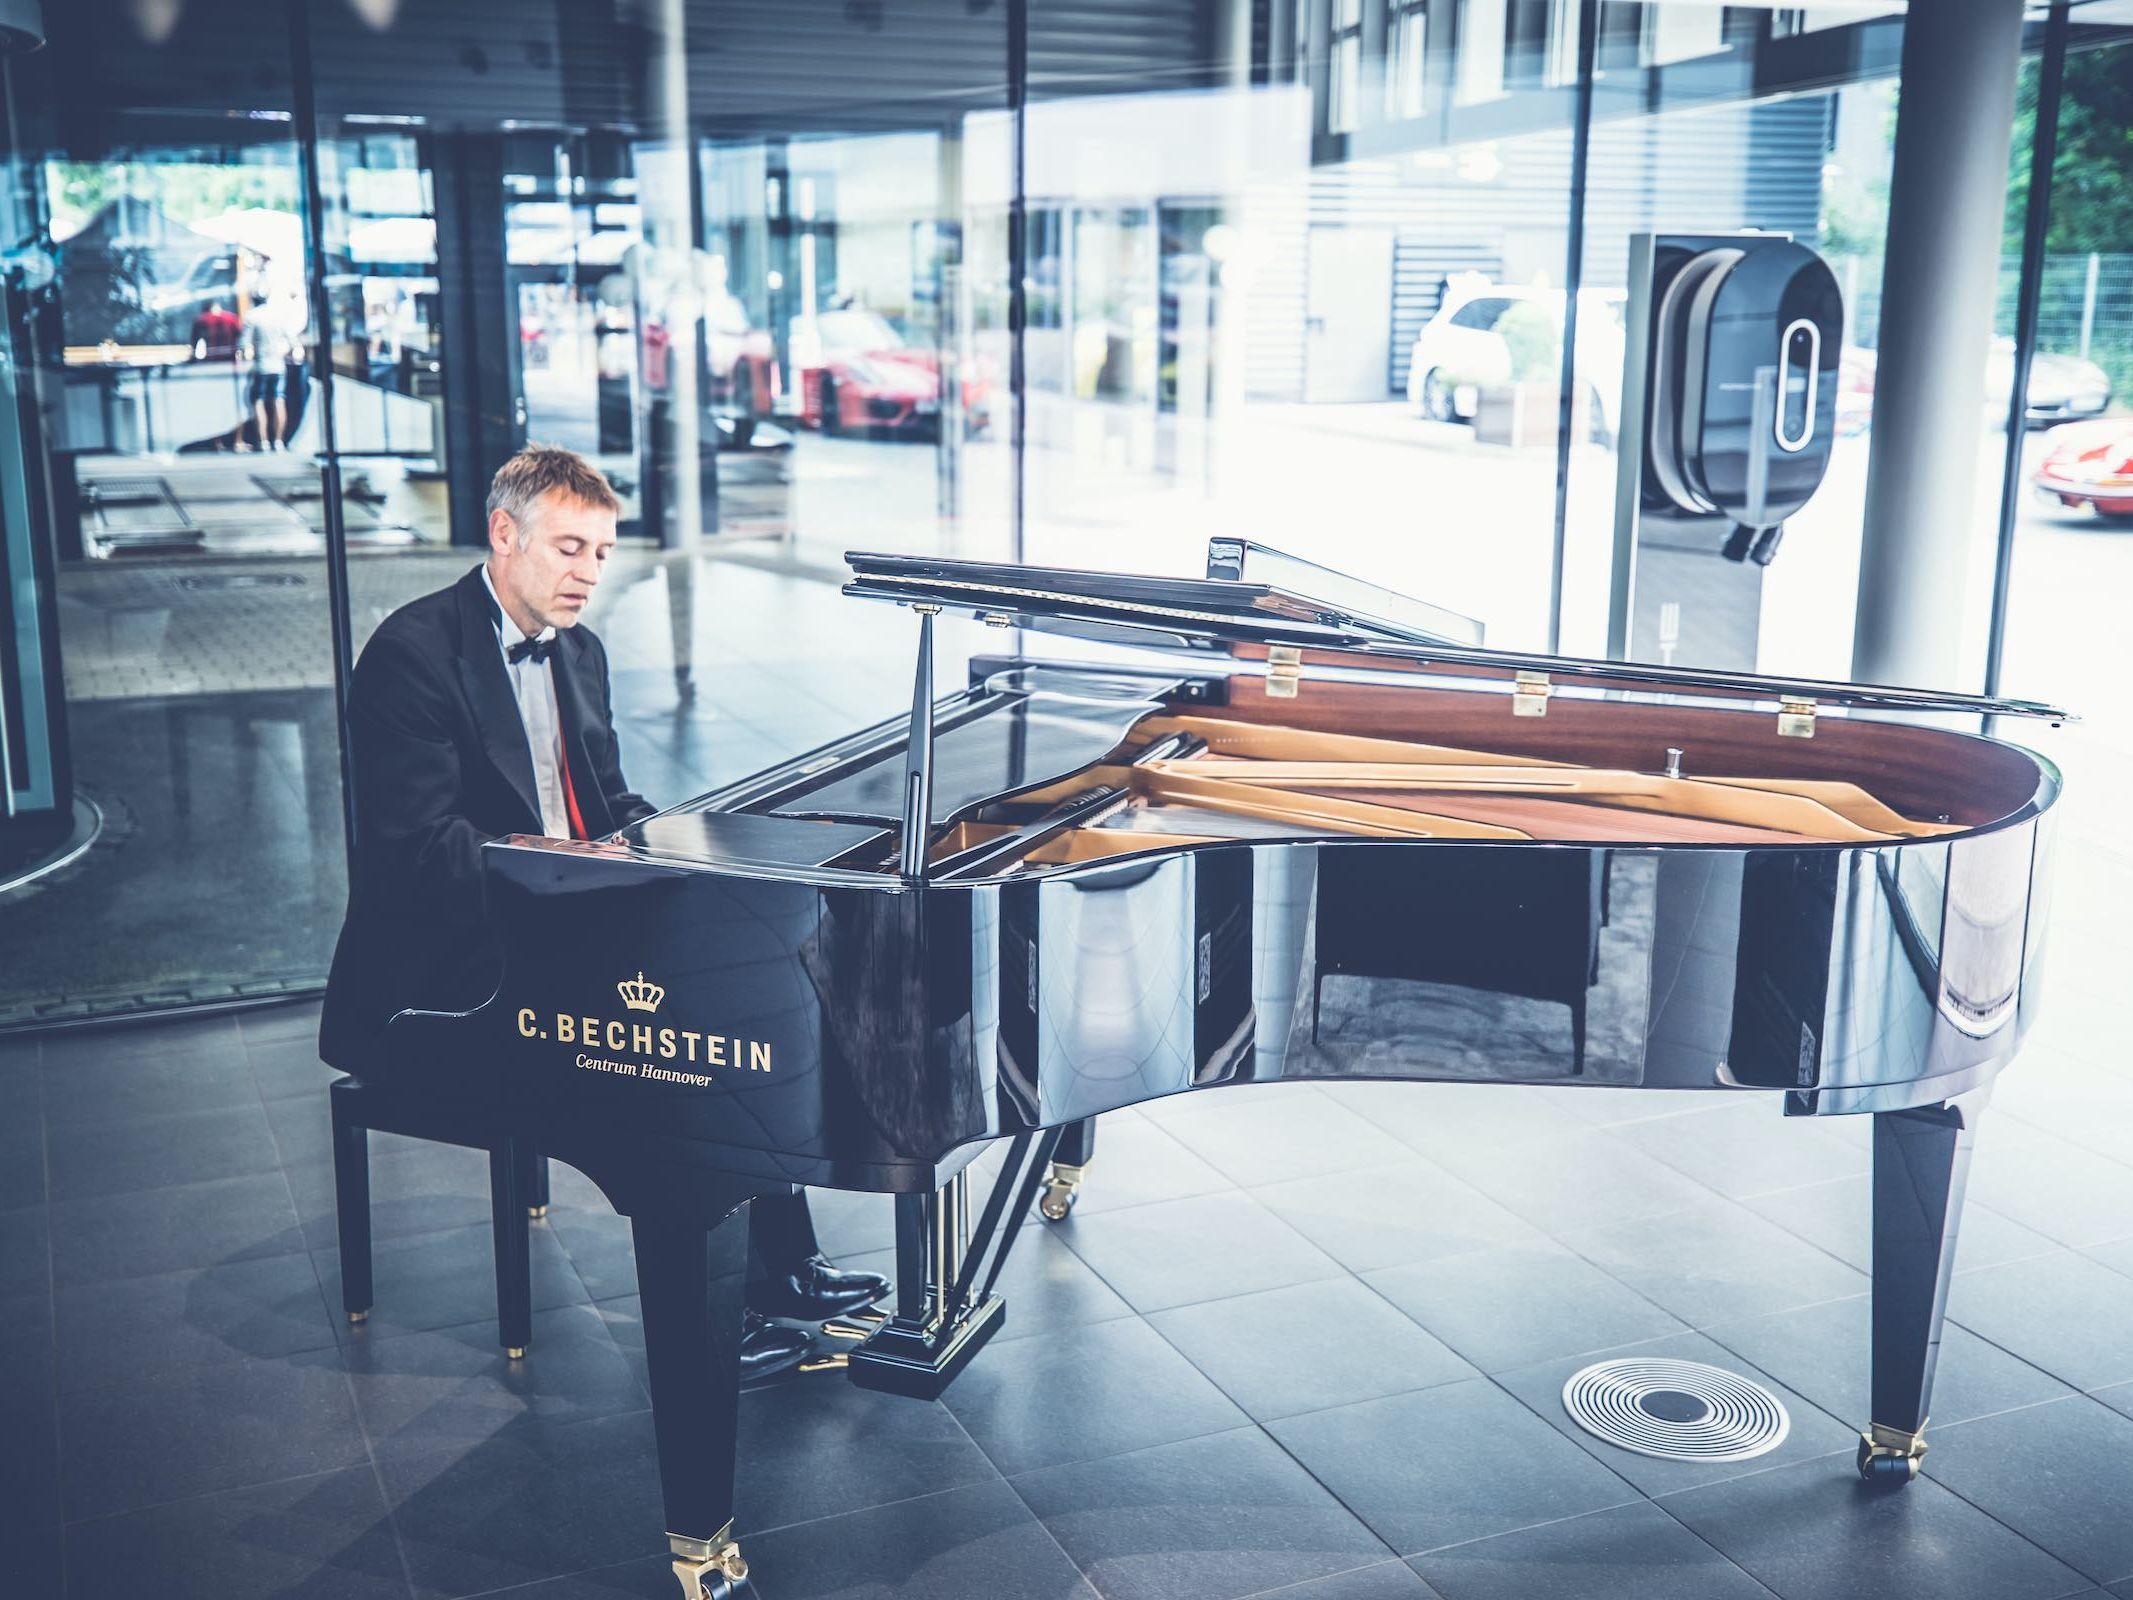 Pianist | Klavierspieler | Hannover | Flügel | Piano | Hochzeit | Buchen | Livemusik | Jazz | Swing | Pop | Motown | Soul | Klavier | Messe | Firmenfeier | Empfang | Buchen | Mieten | Anfragen | Lehmann | Eventservice